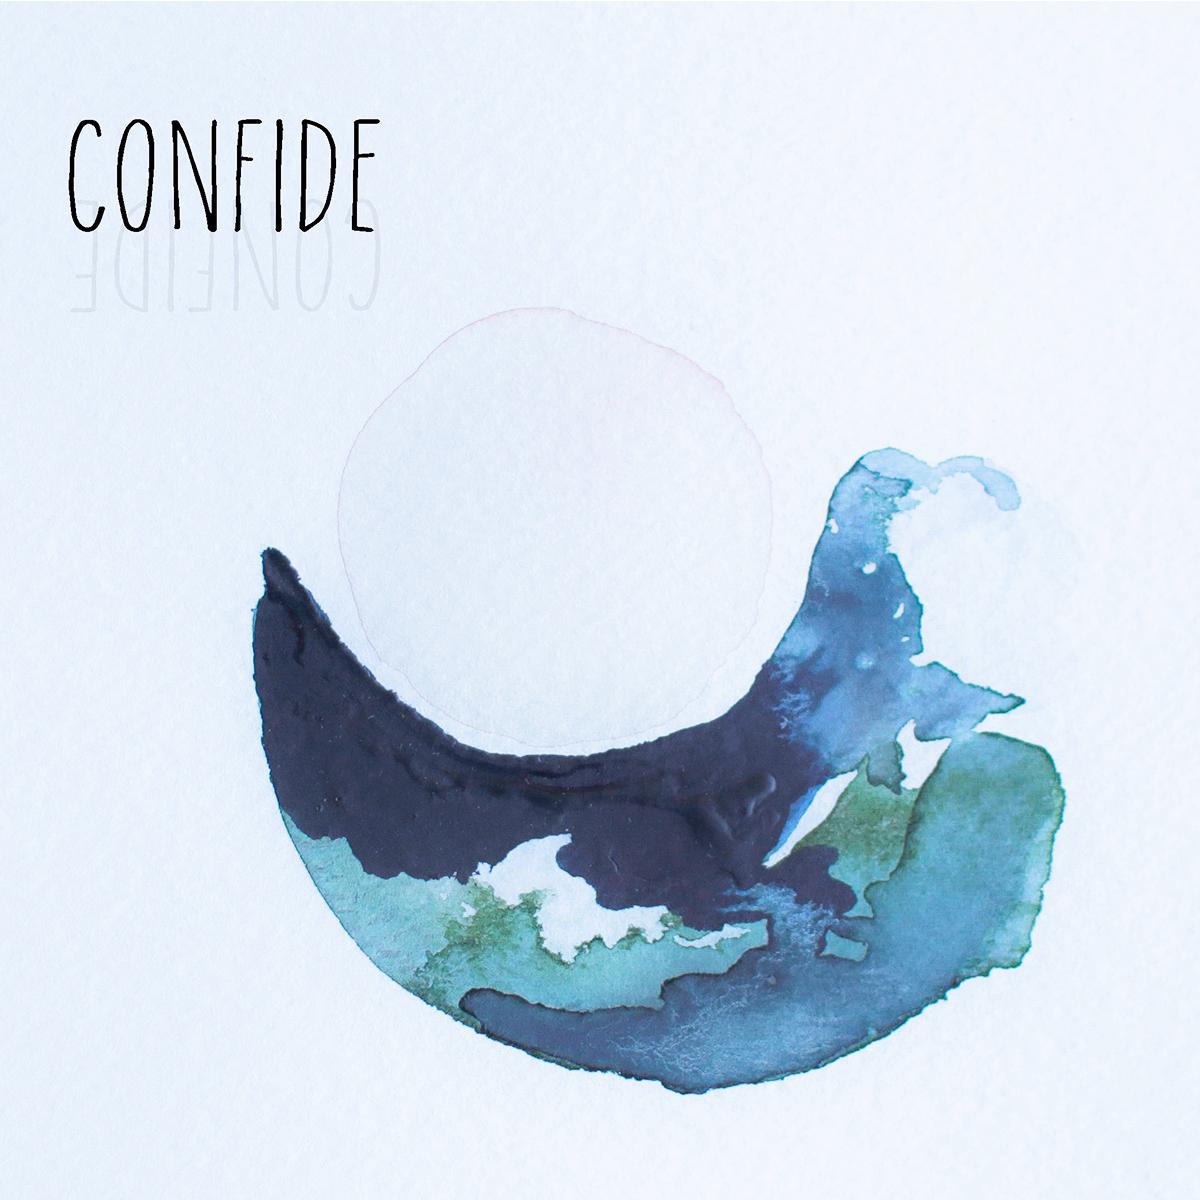 confide *.jpg